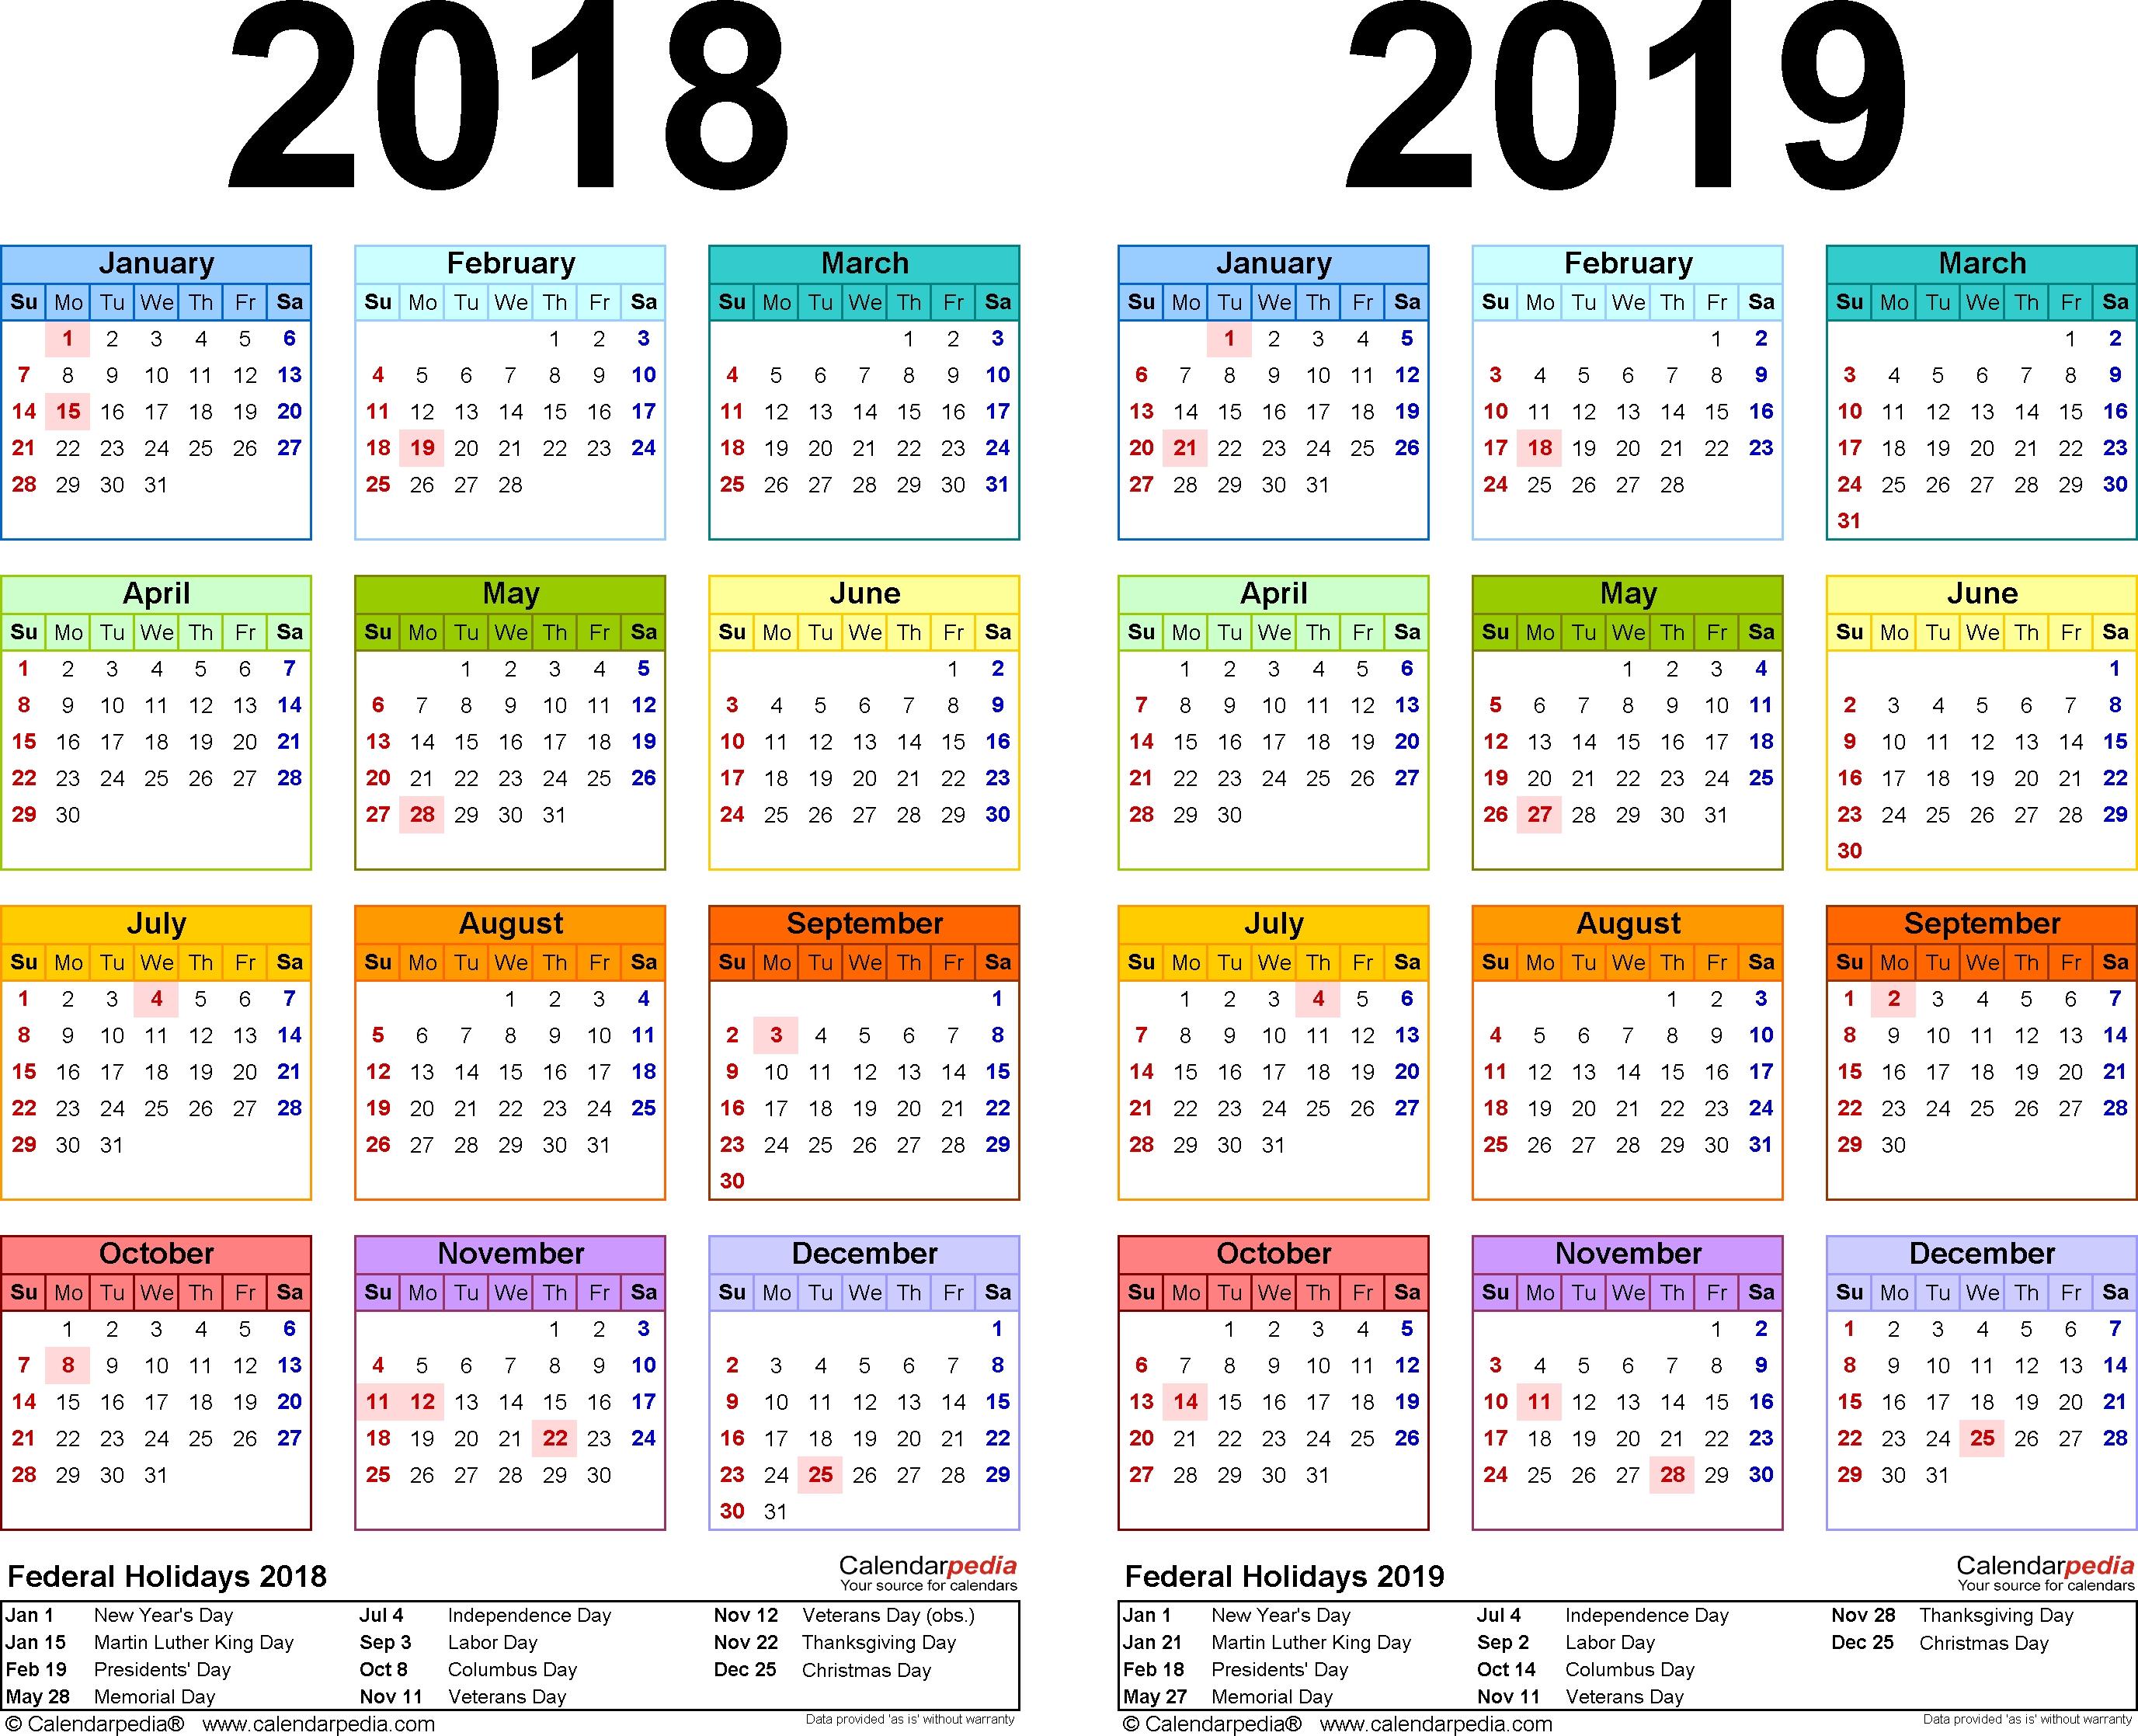 2018-2019 Calendar - Free Printable Two-Year Pdf Calendars with regard to Free Printable Calendar With Lines 2019 And 2020